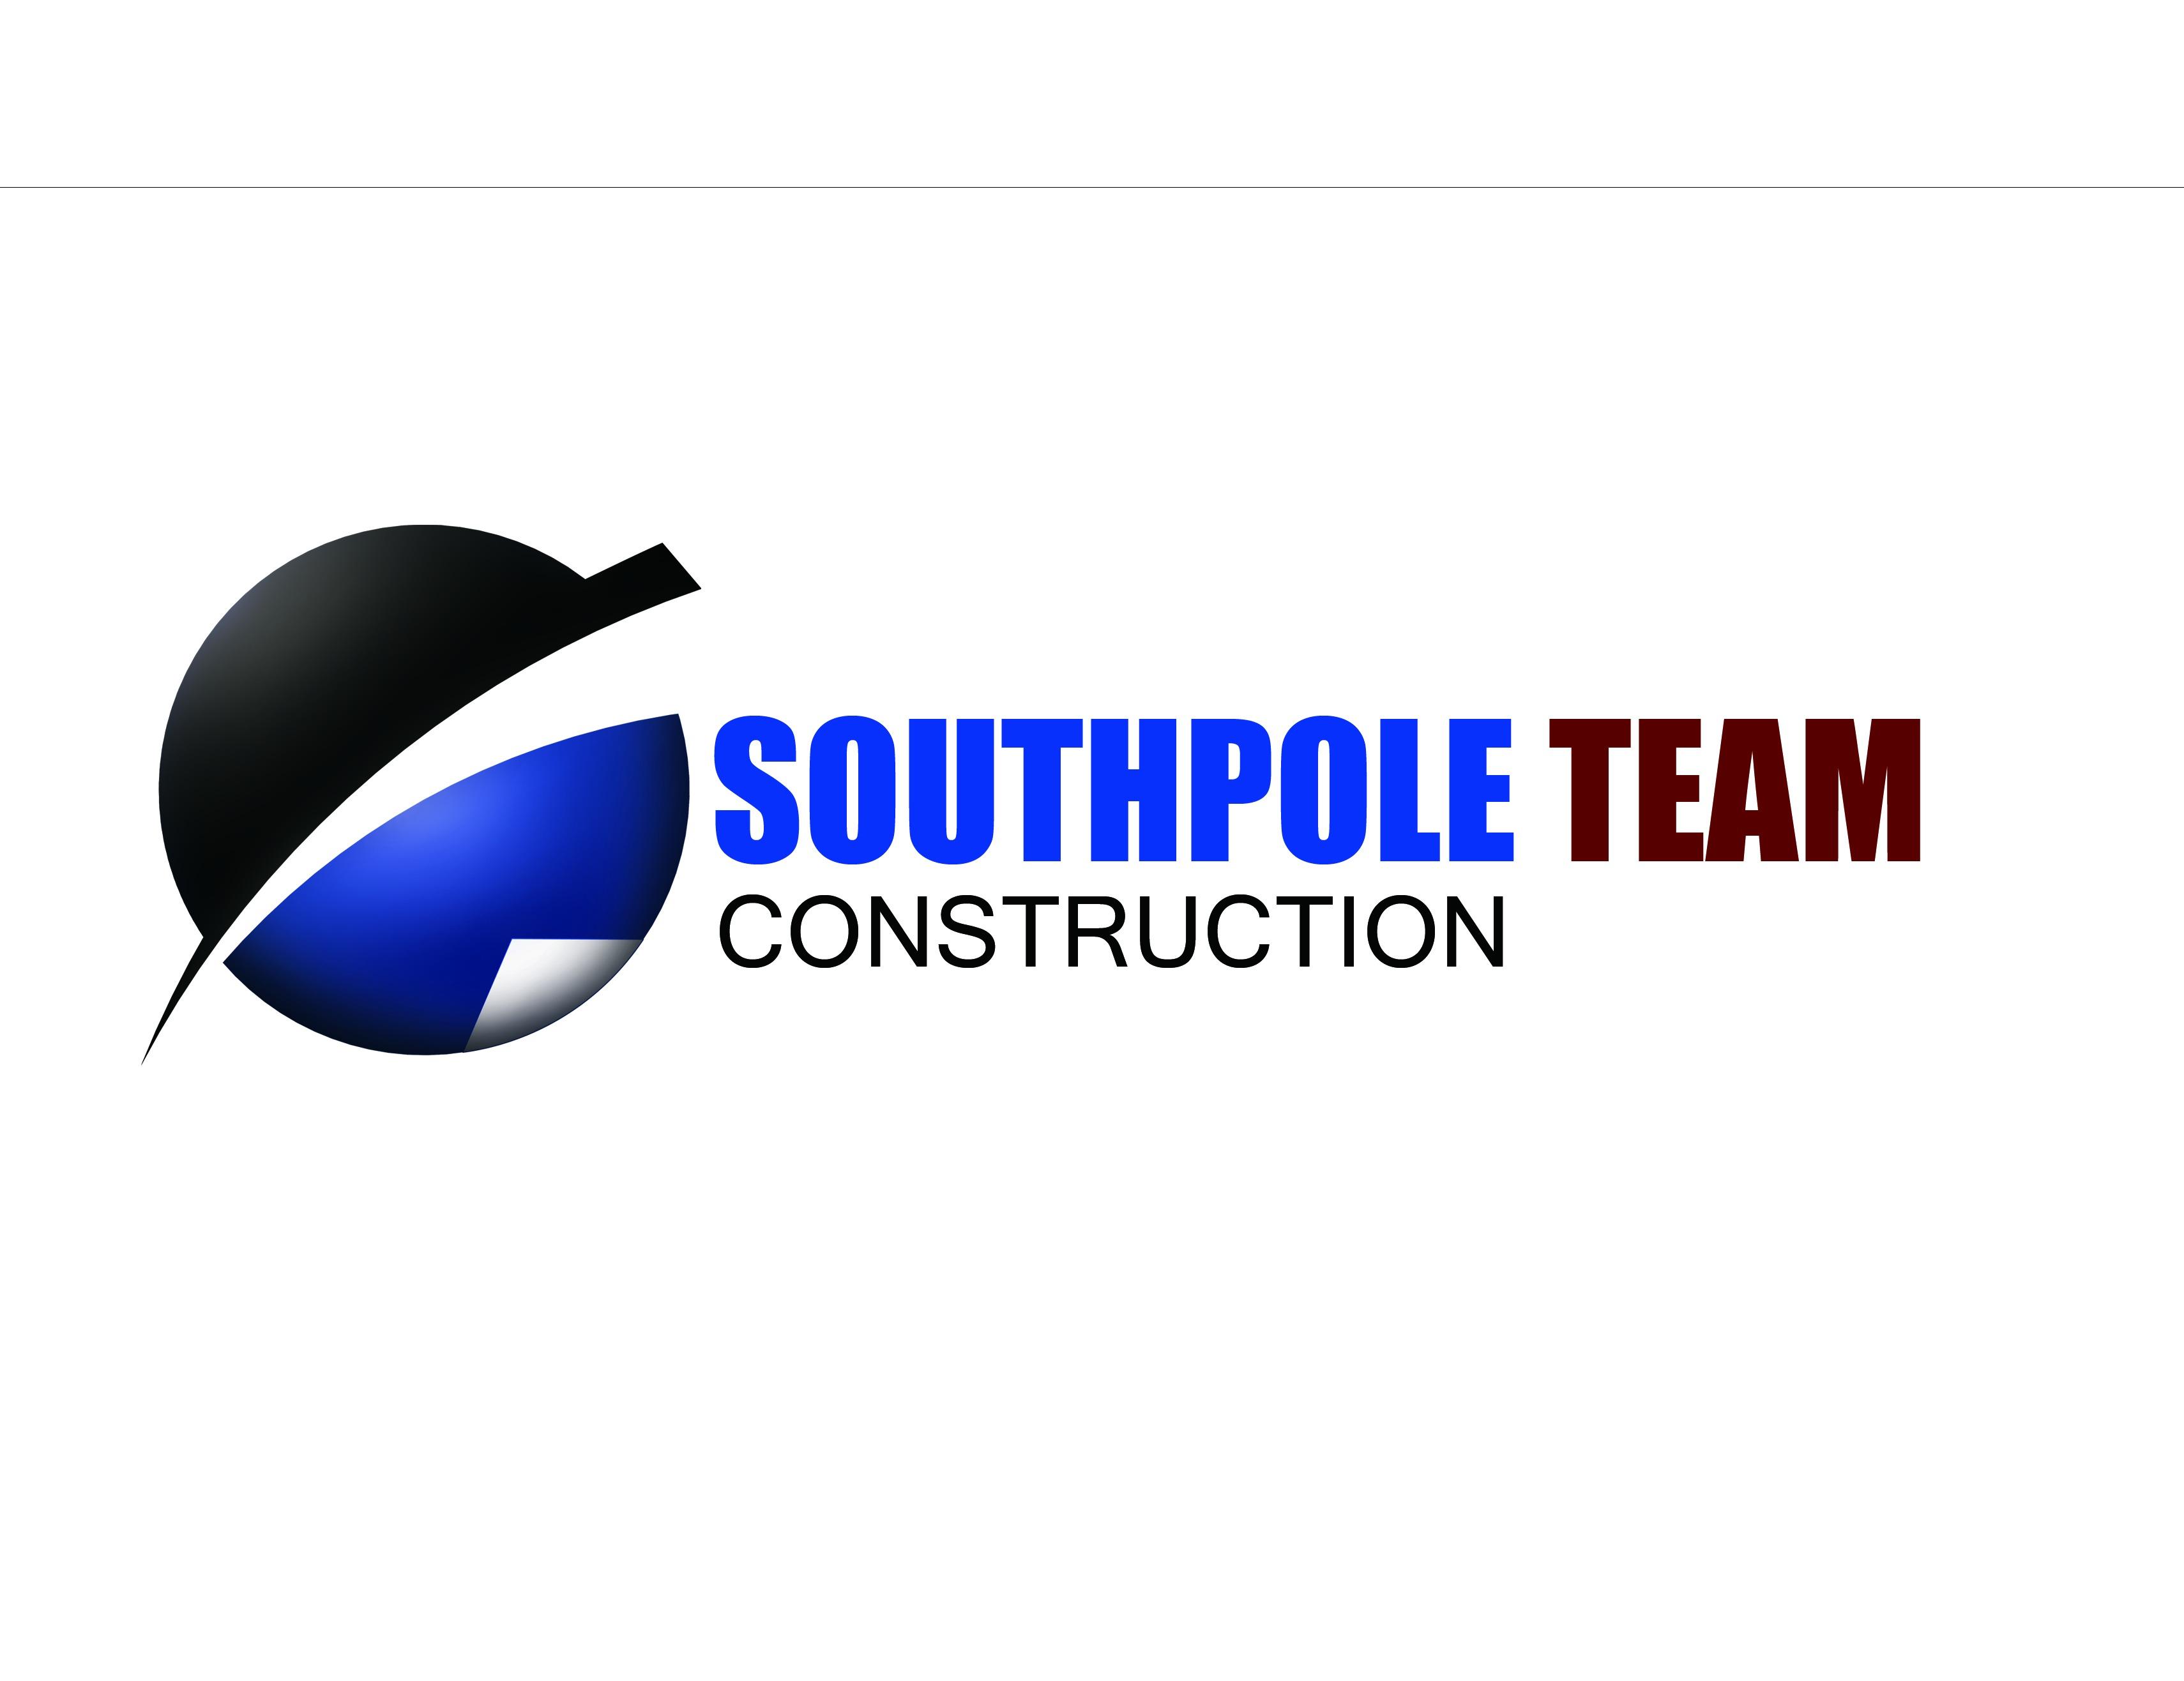 NZSouthpole Team Ltd